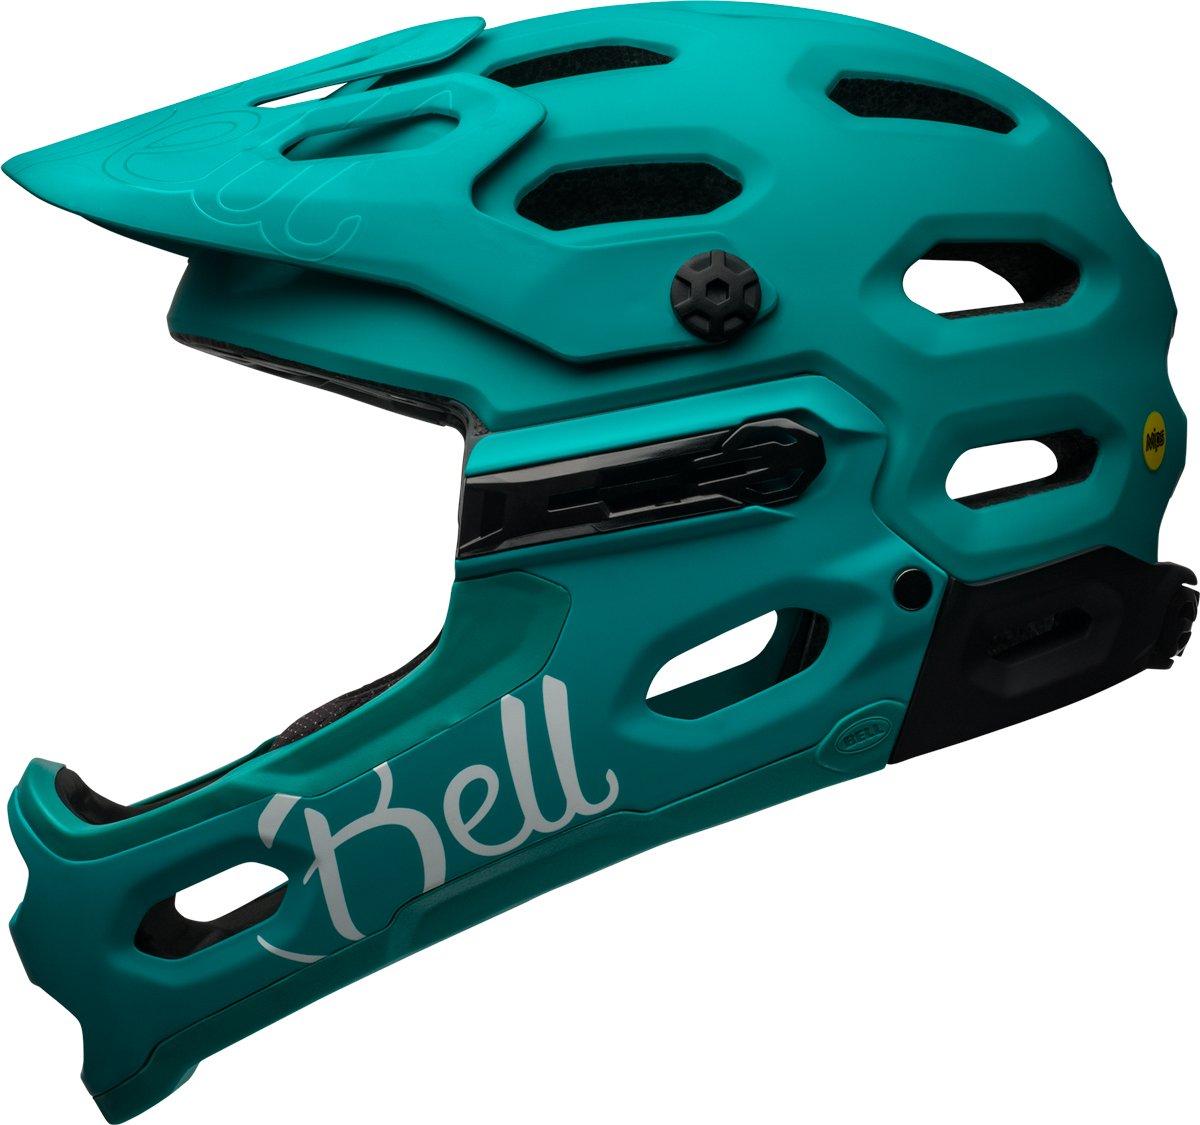 BELL Super 3R MIPS Damen MTB Fahrrad Helm grün 2017